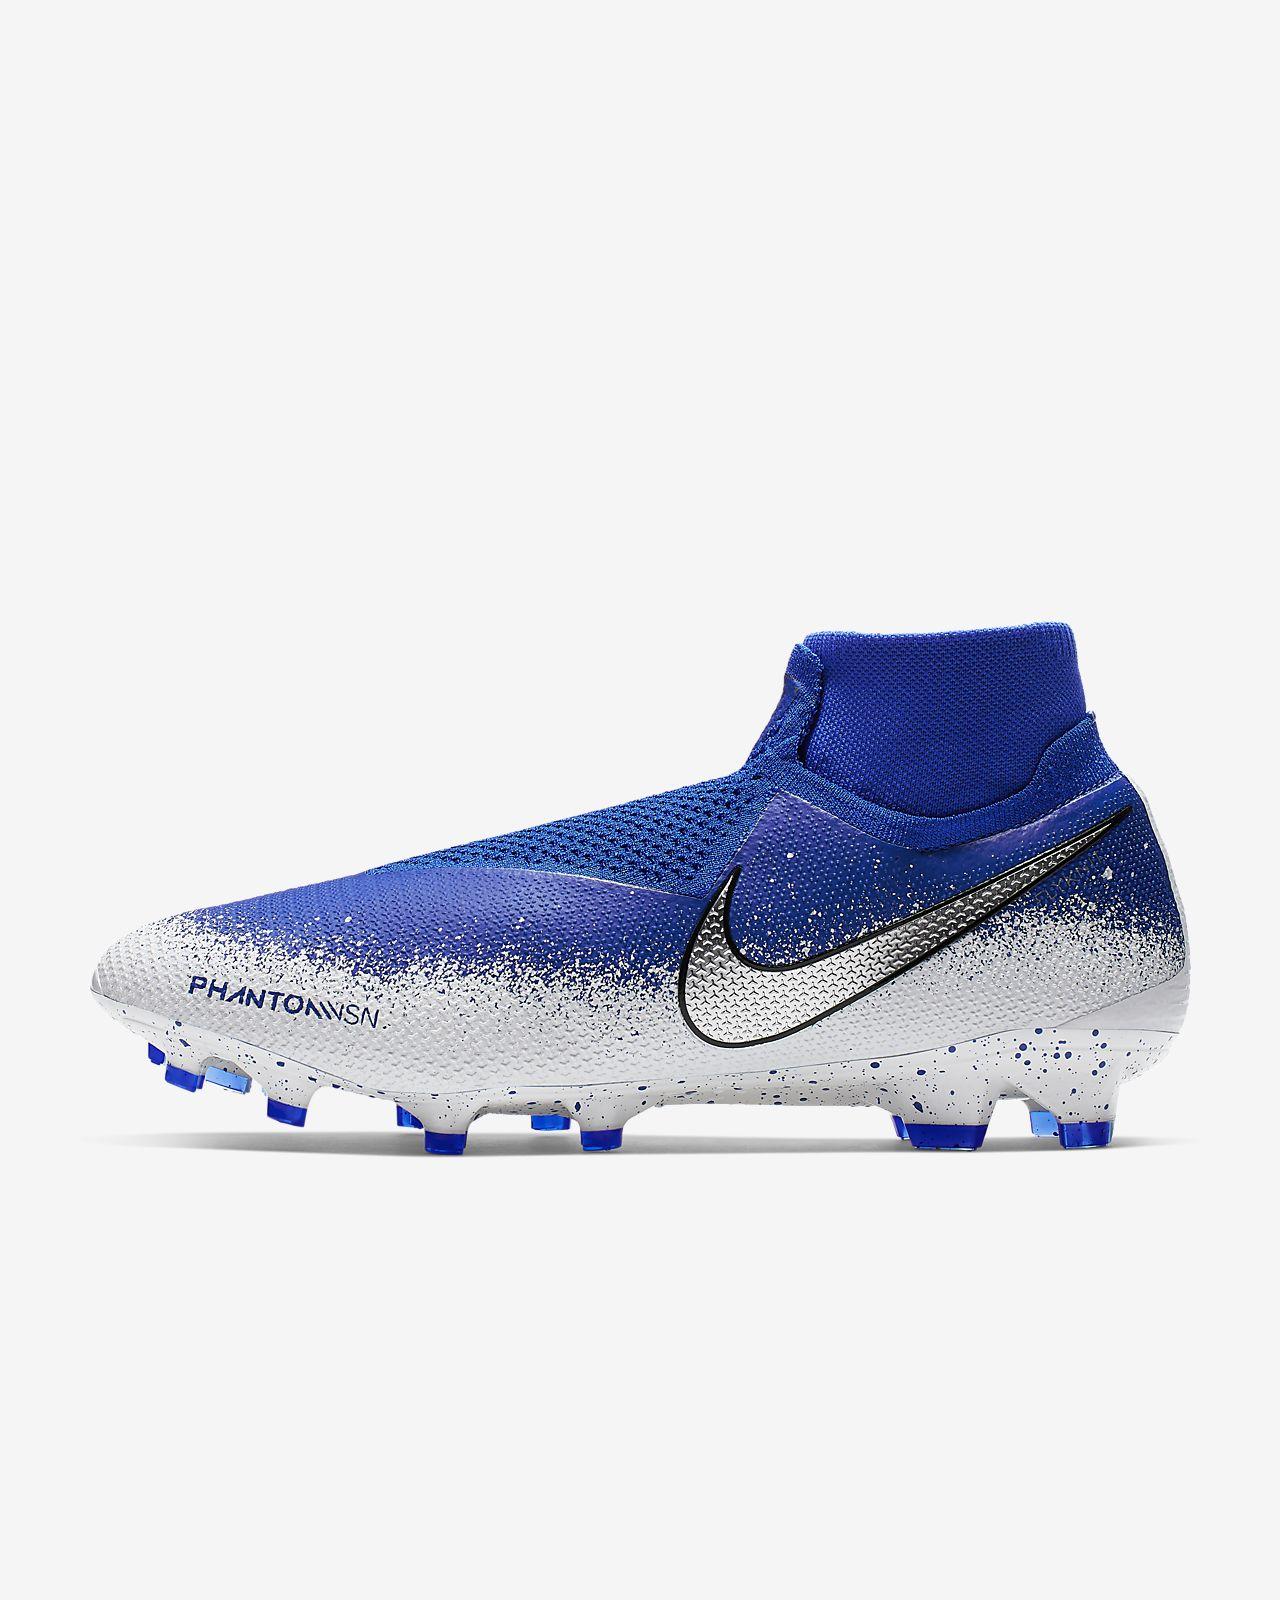 Pour Terrain Crampons De Nike À Sec Chaussure Phantom Football W9DYEHI2